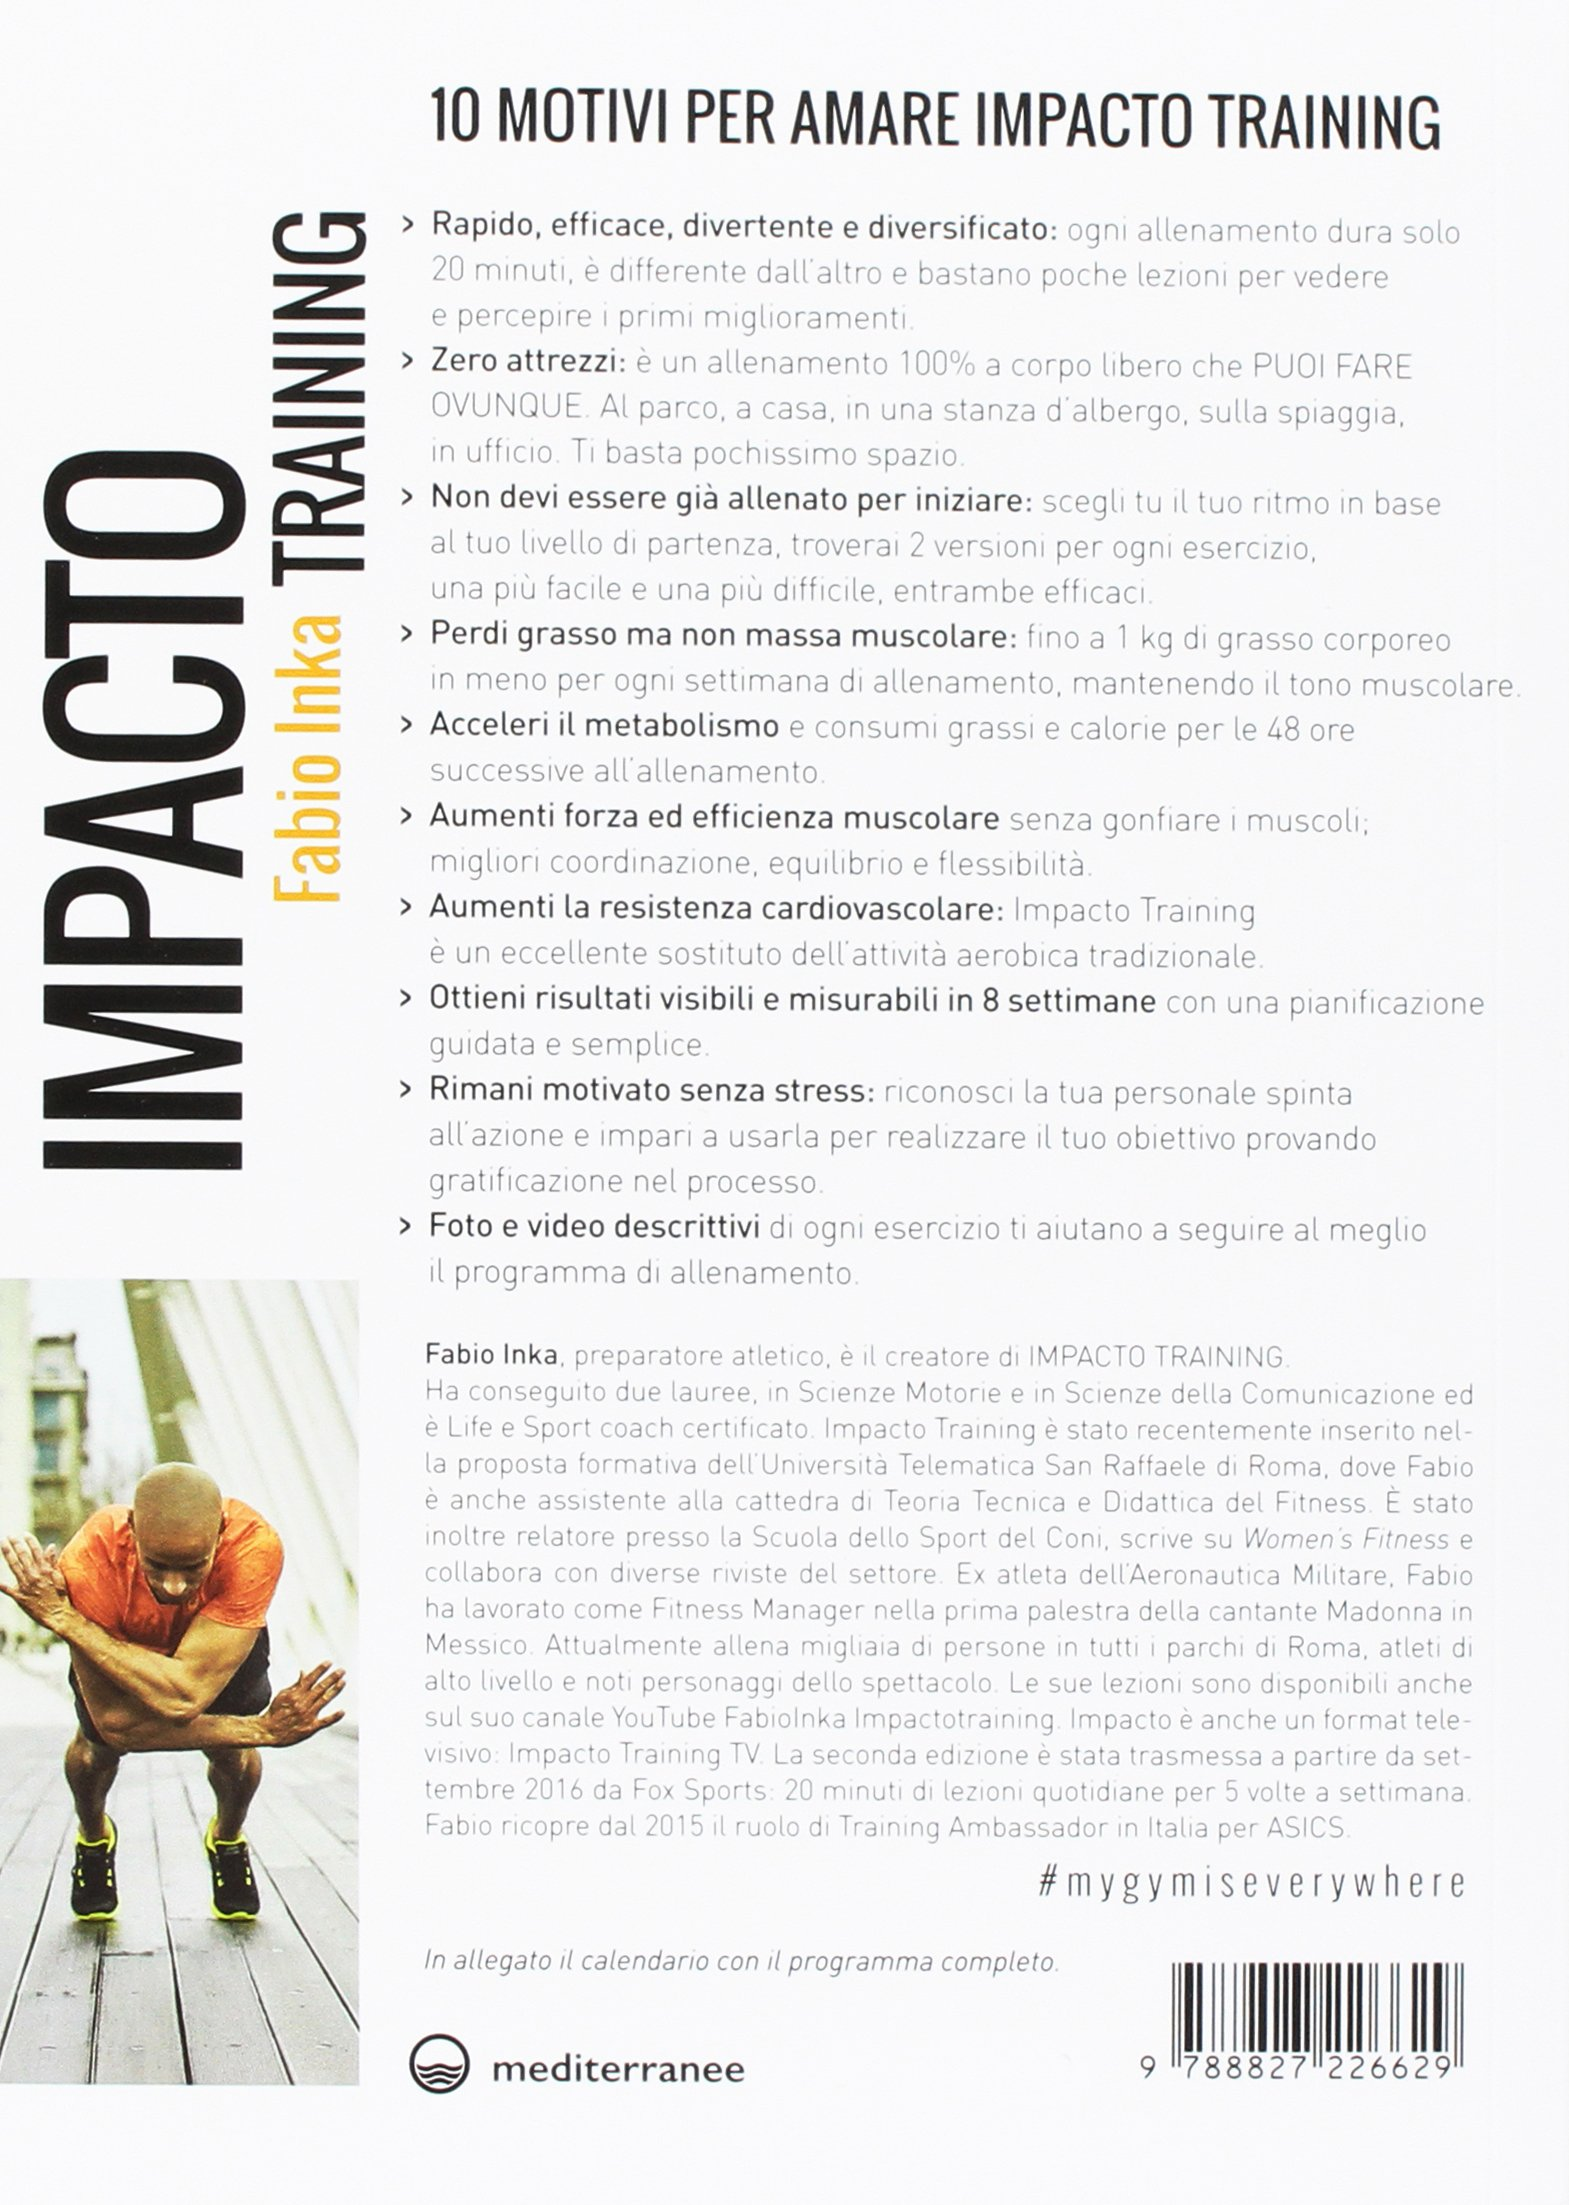 Impacto Training Calendario.Fabio Inka Impacto Training Amazon Co Uk Fabio Inka